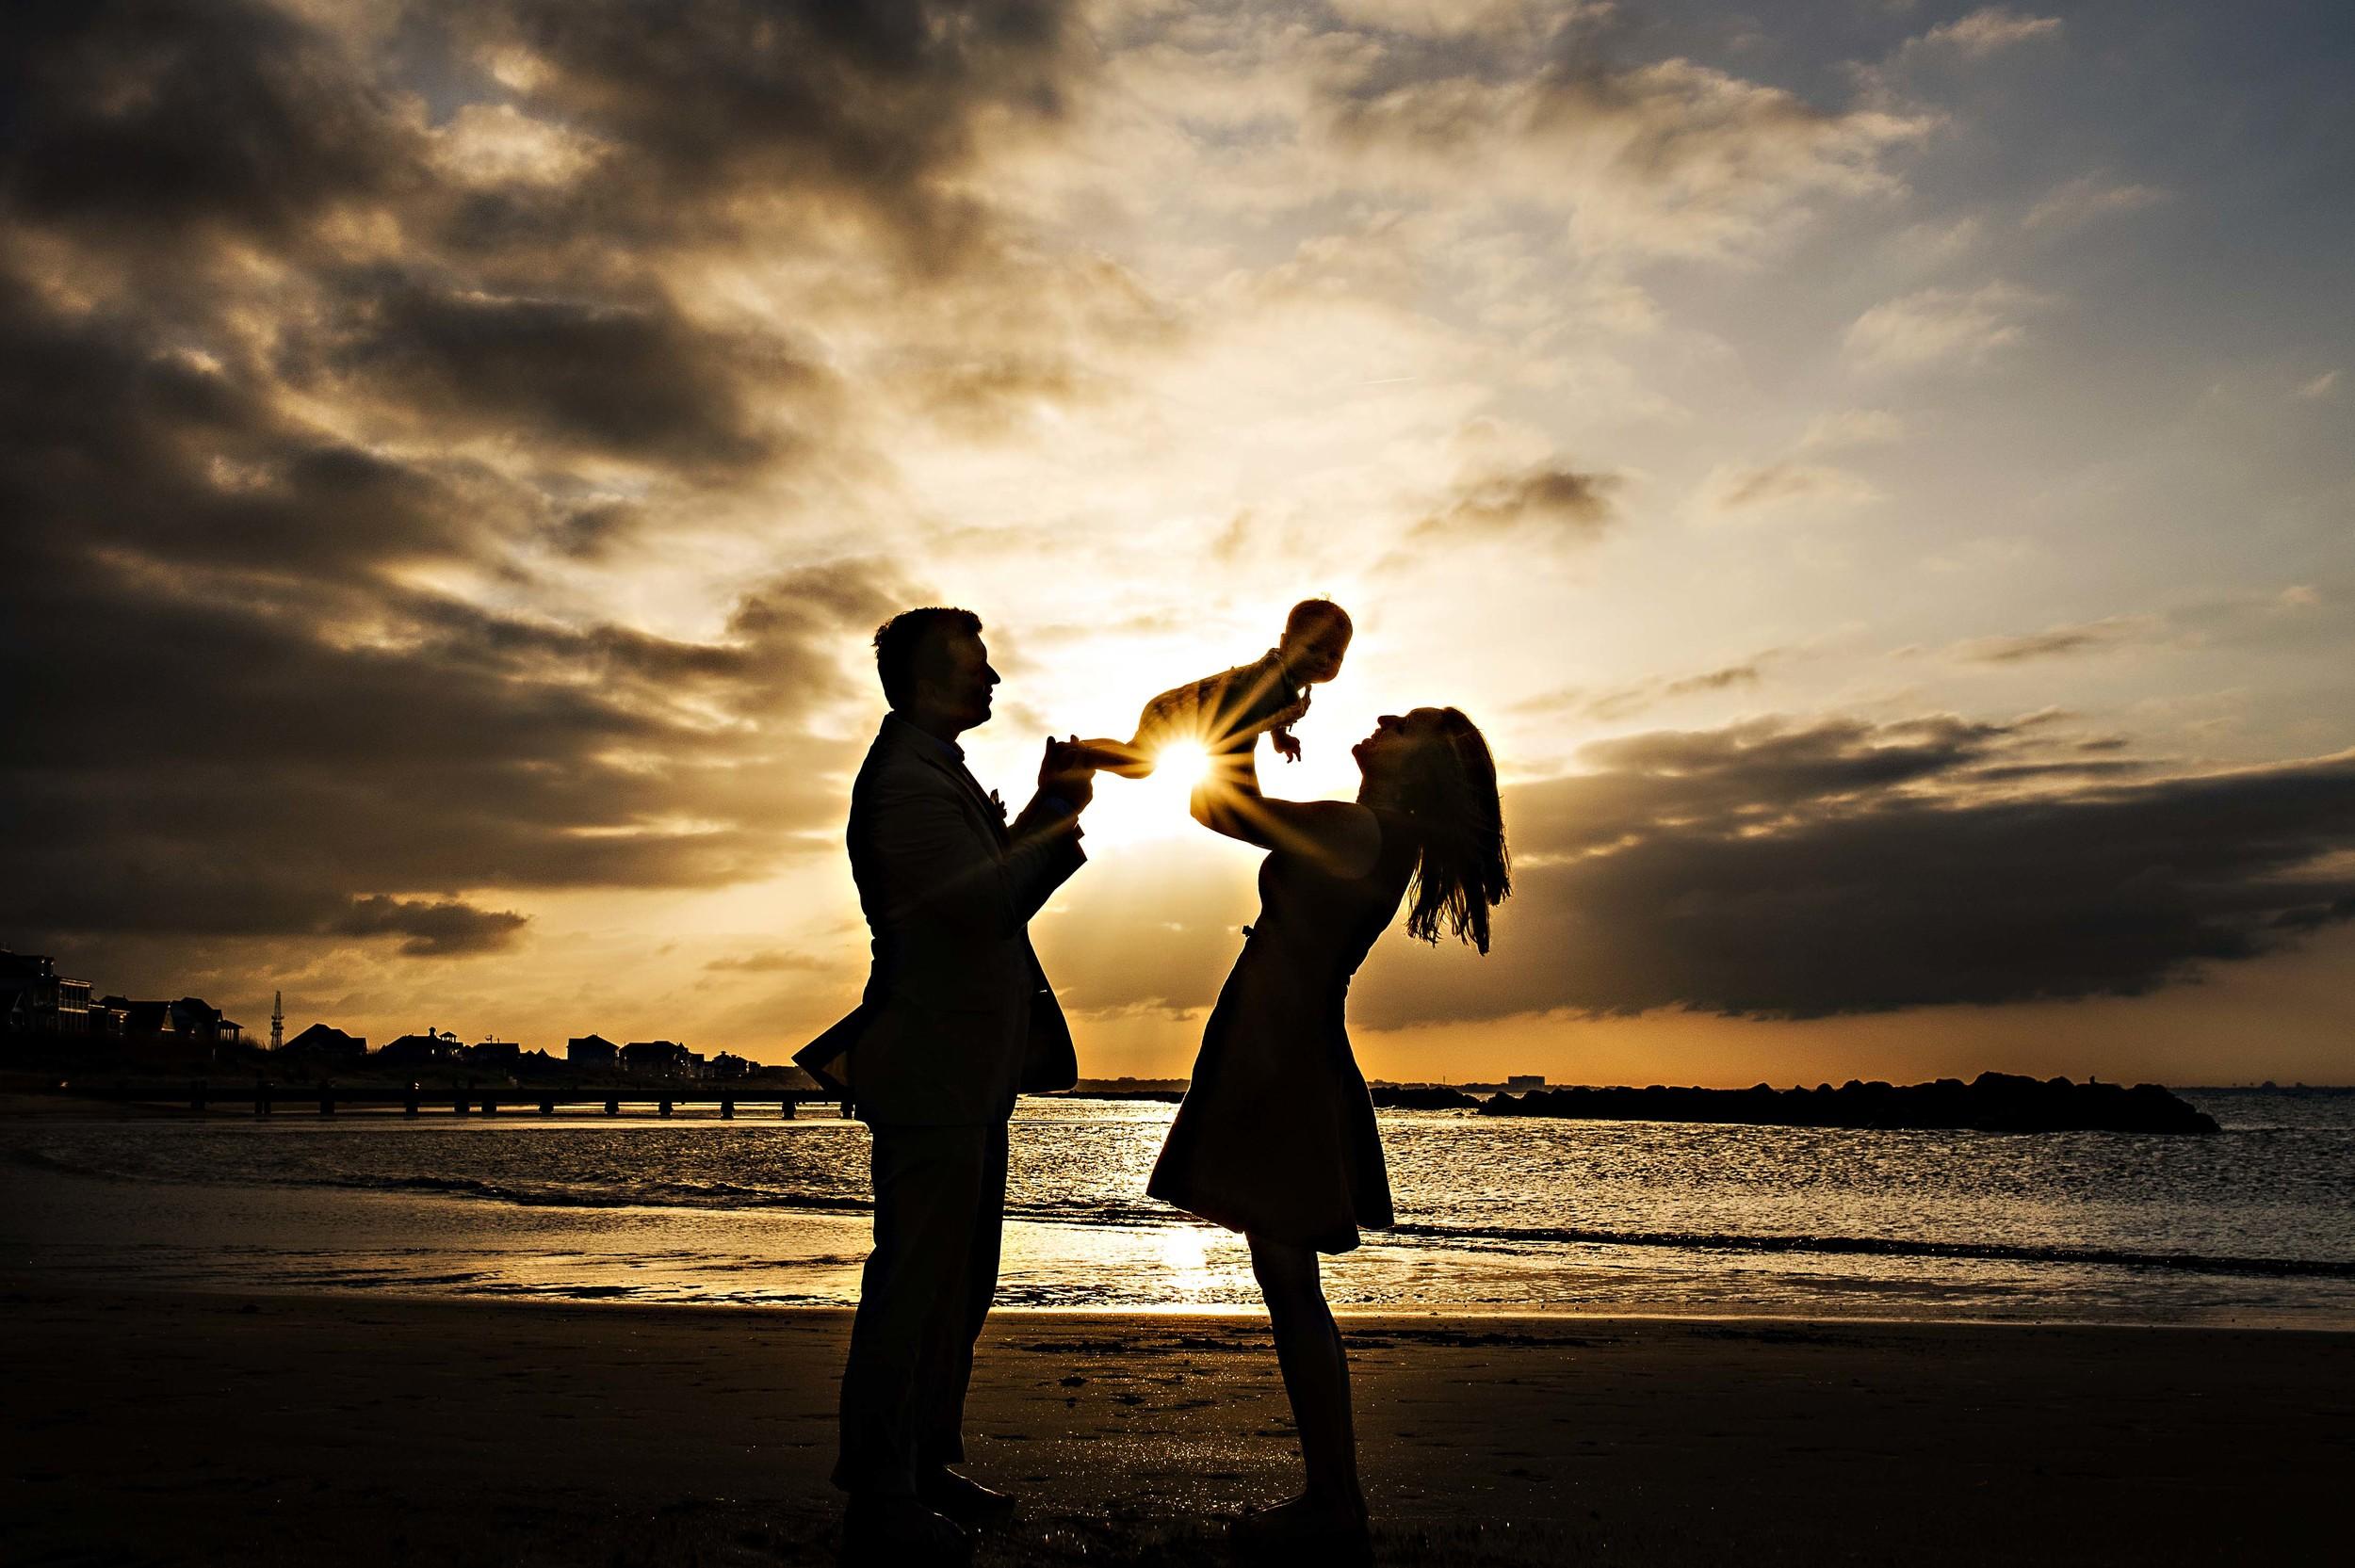 virginia-beach-sandbridge-family-photographers-norfolk-chesapeake-suffolk-photographer-melissa-bliss-photography-beach-photos